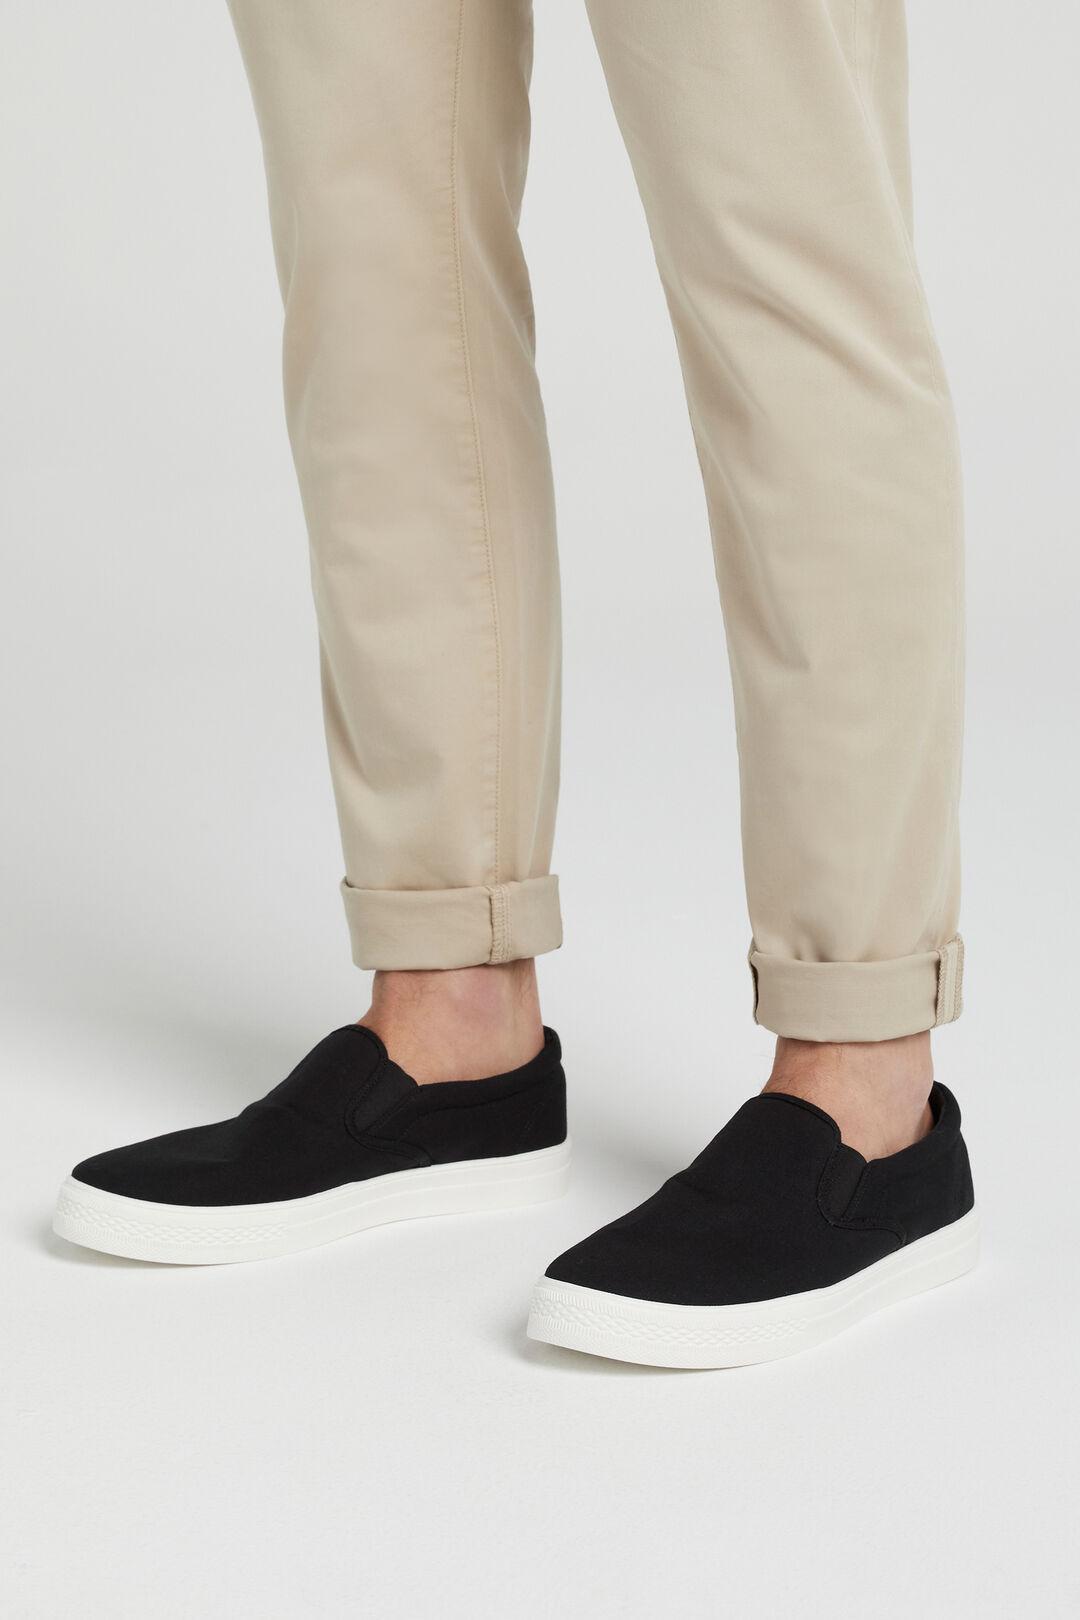 CANVAS SLIP ON SNEAKER  BLACK  hi-res